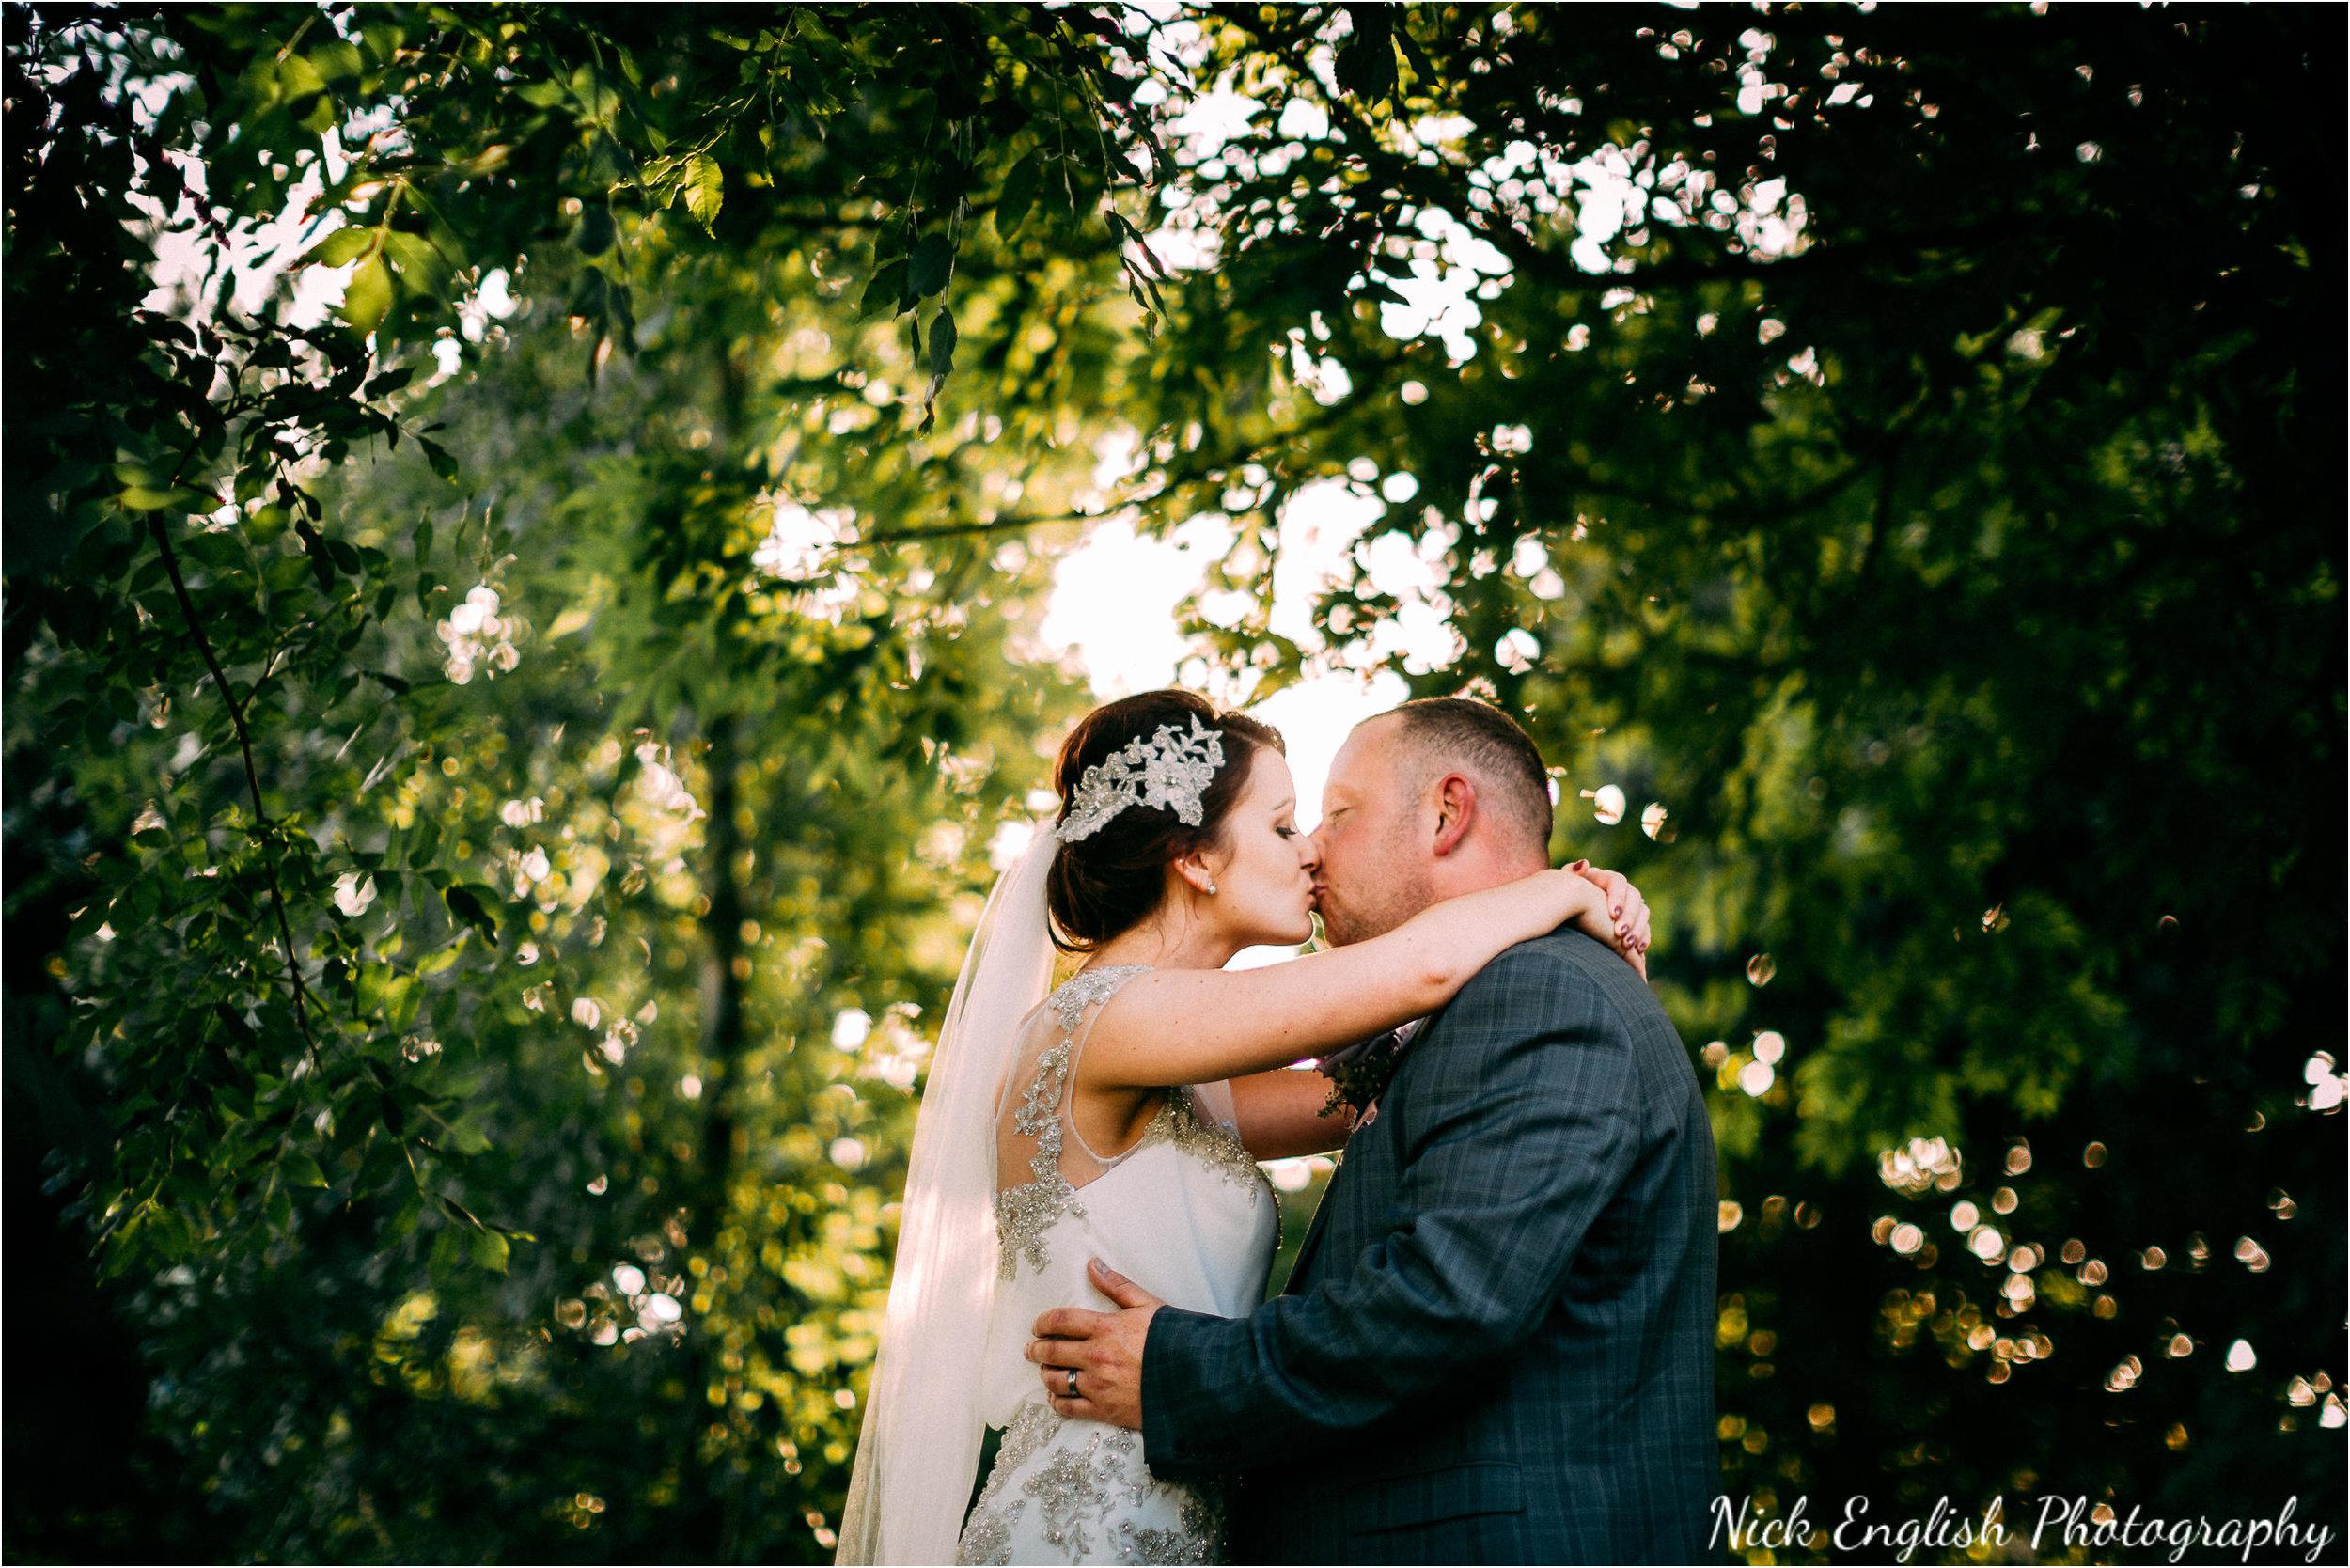 Stacey-Ash-Wedding-Photographs-Stanley-House-Preston-Lancashire-209.jpg